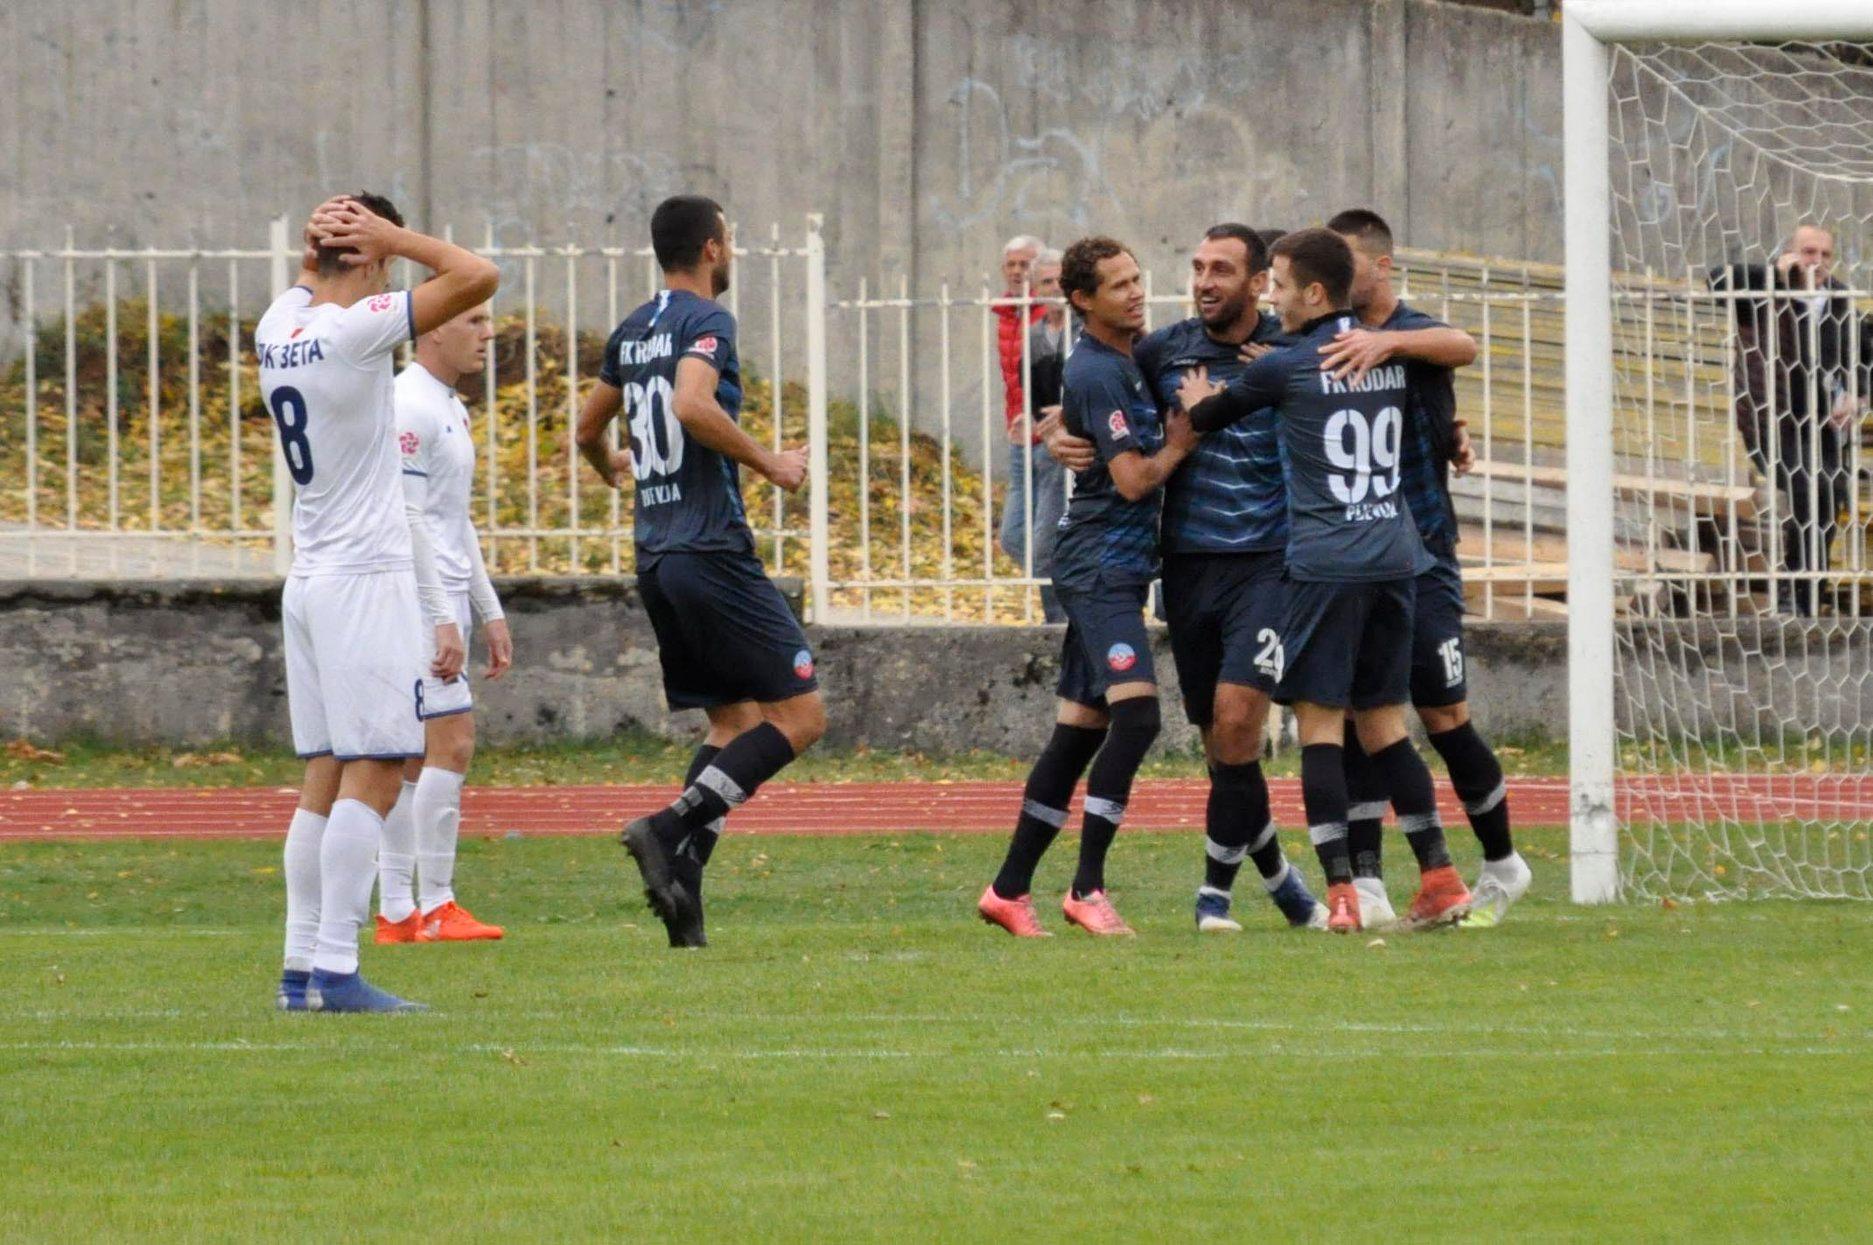 Slavlje igrača Rudara nakon gola protiv Zete